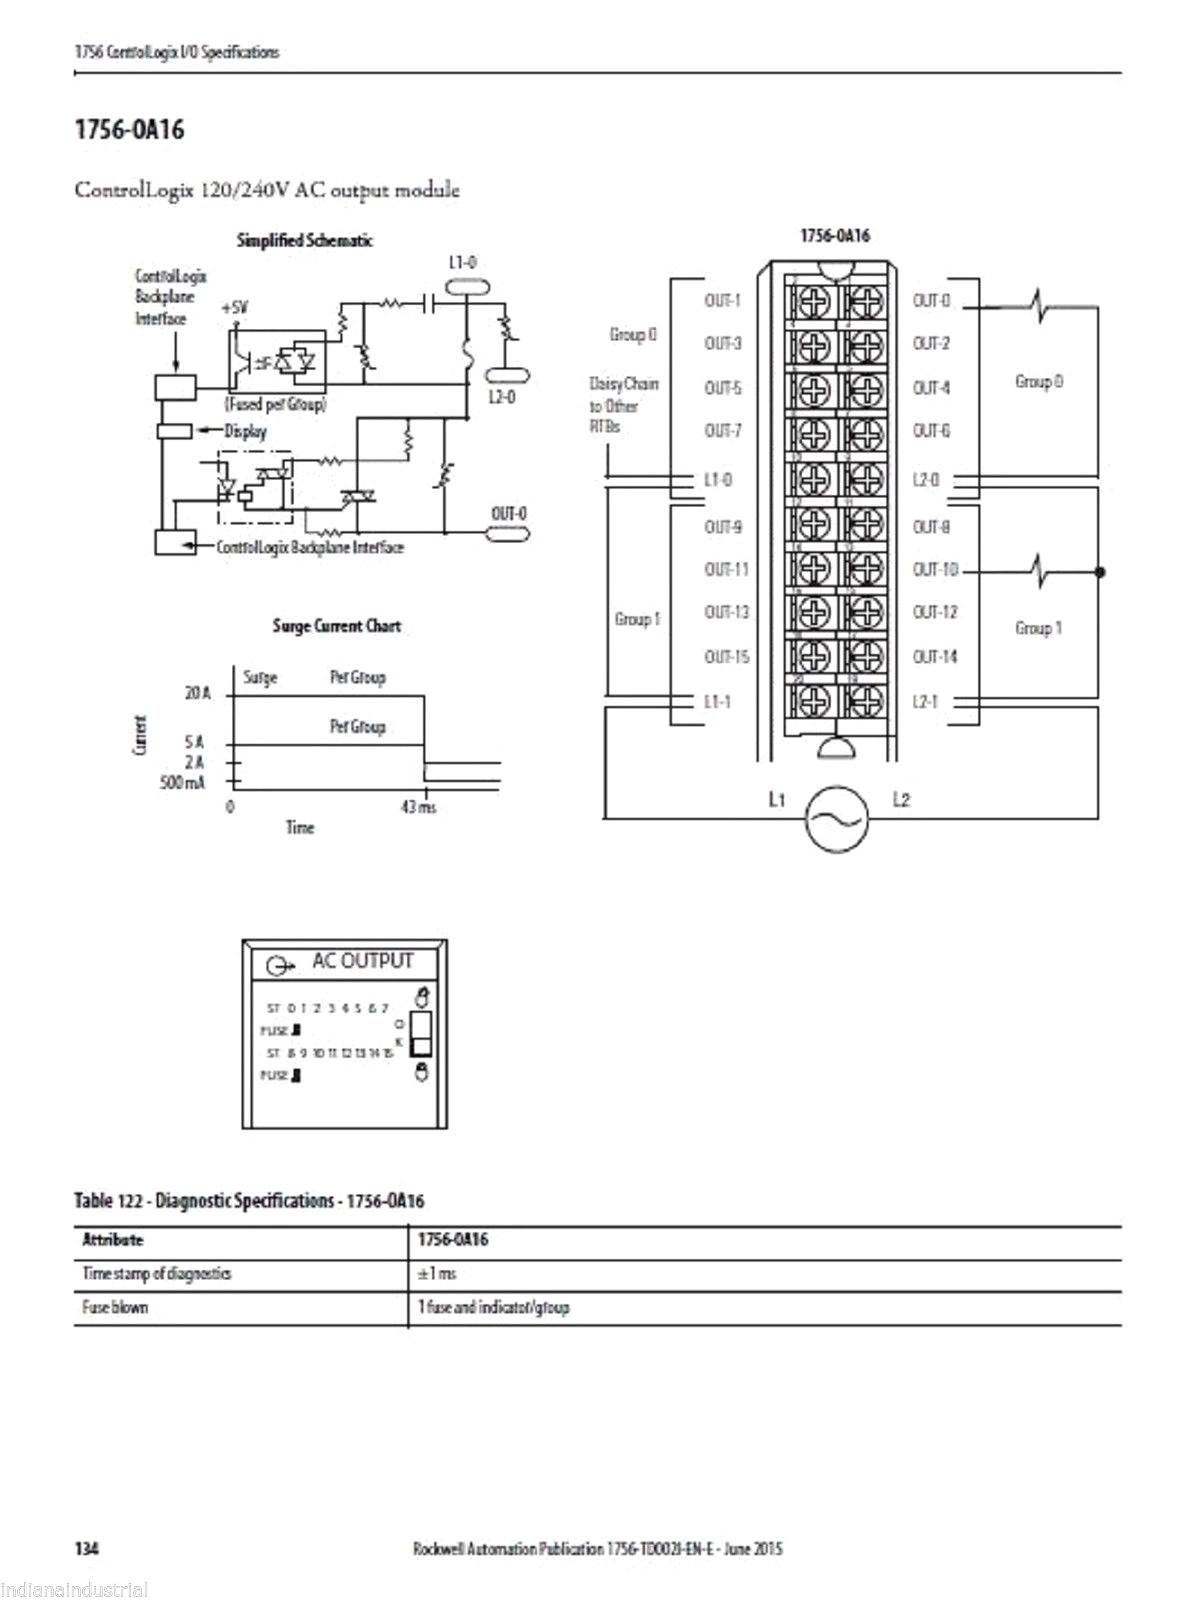 Rv Circuit Analyzer Not Lossing Wiring Diagram For A 3 Lamp Ballast T8 Sample Tektronix Spectrum Agilent